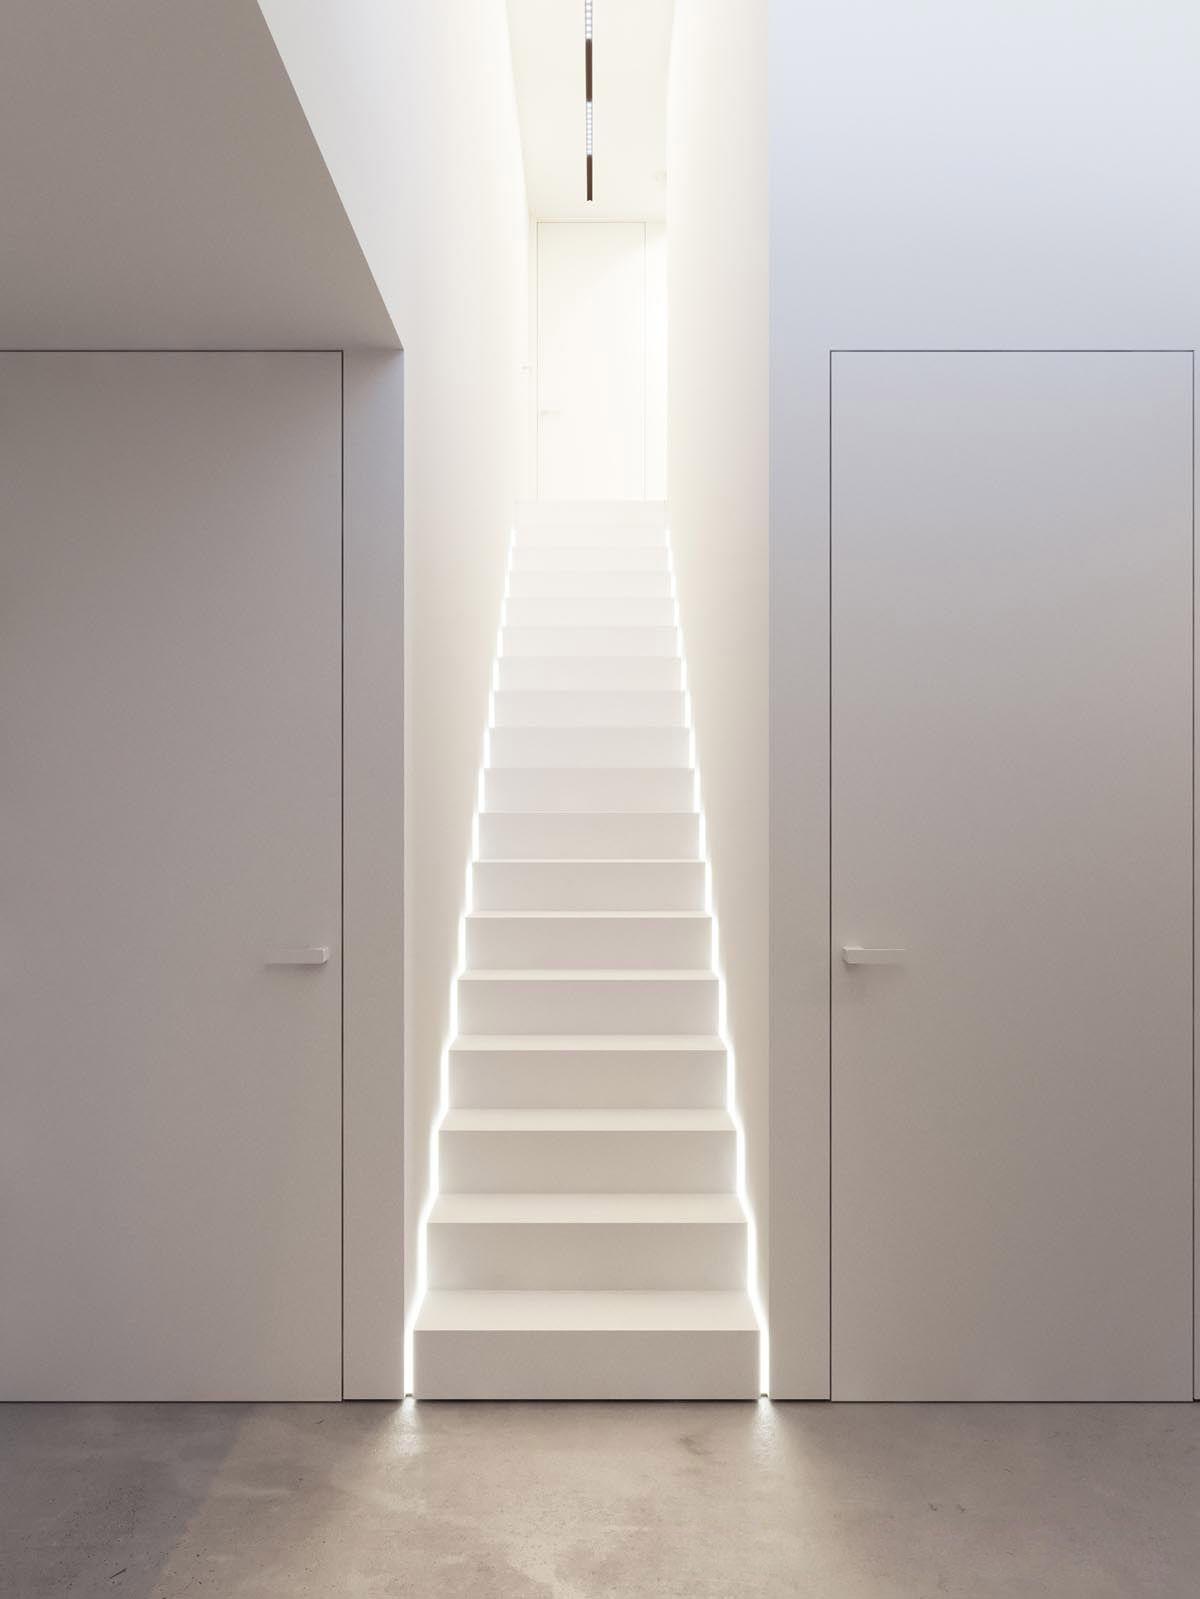 All white interior design tips with example images to for Arredare casa vastu